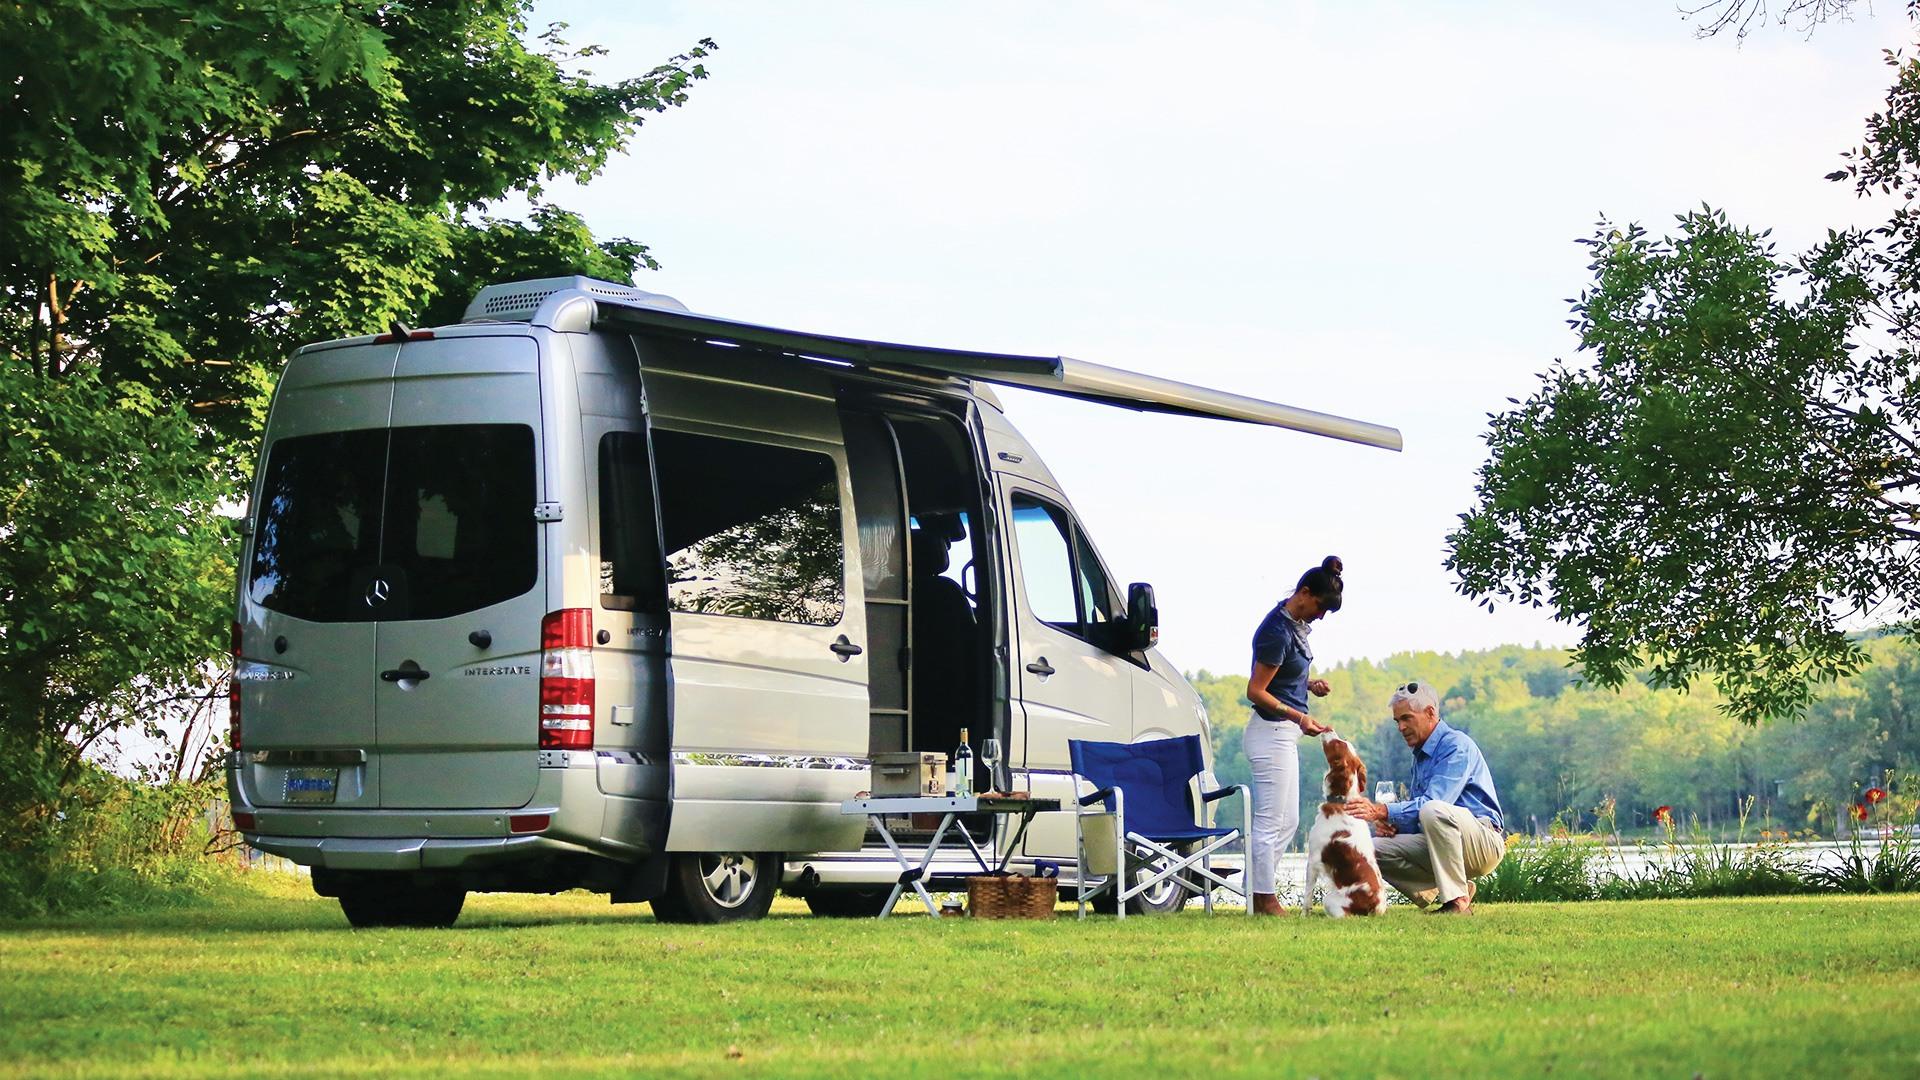 Airstream Interstate Nineteen Mercedes Sprinter touring coach